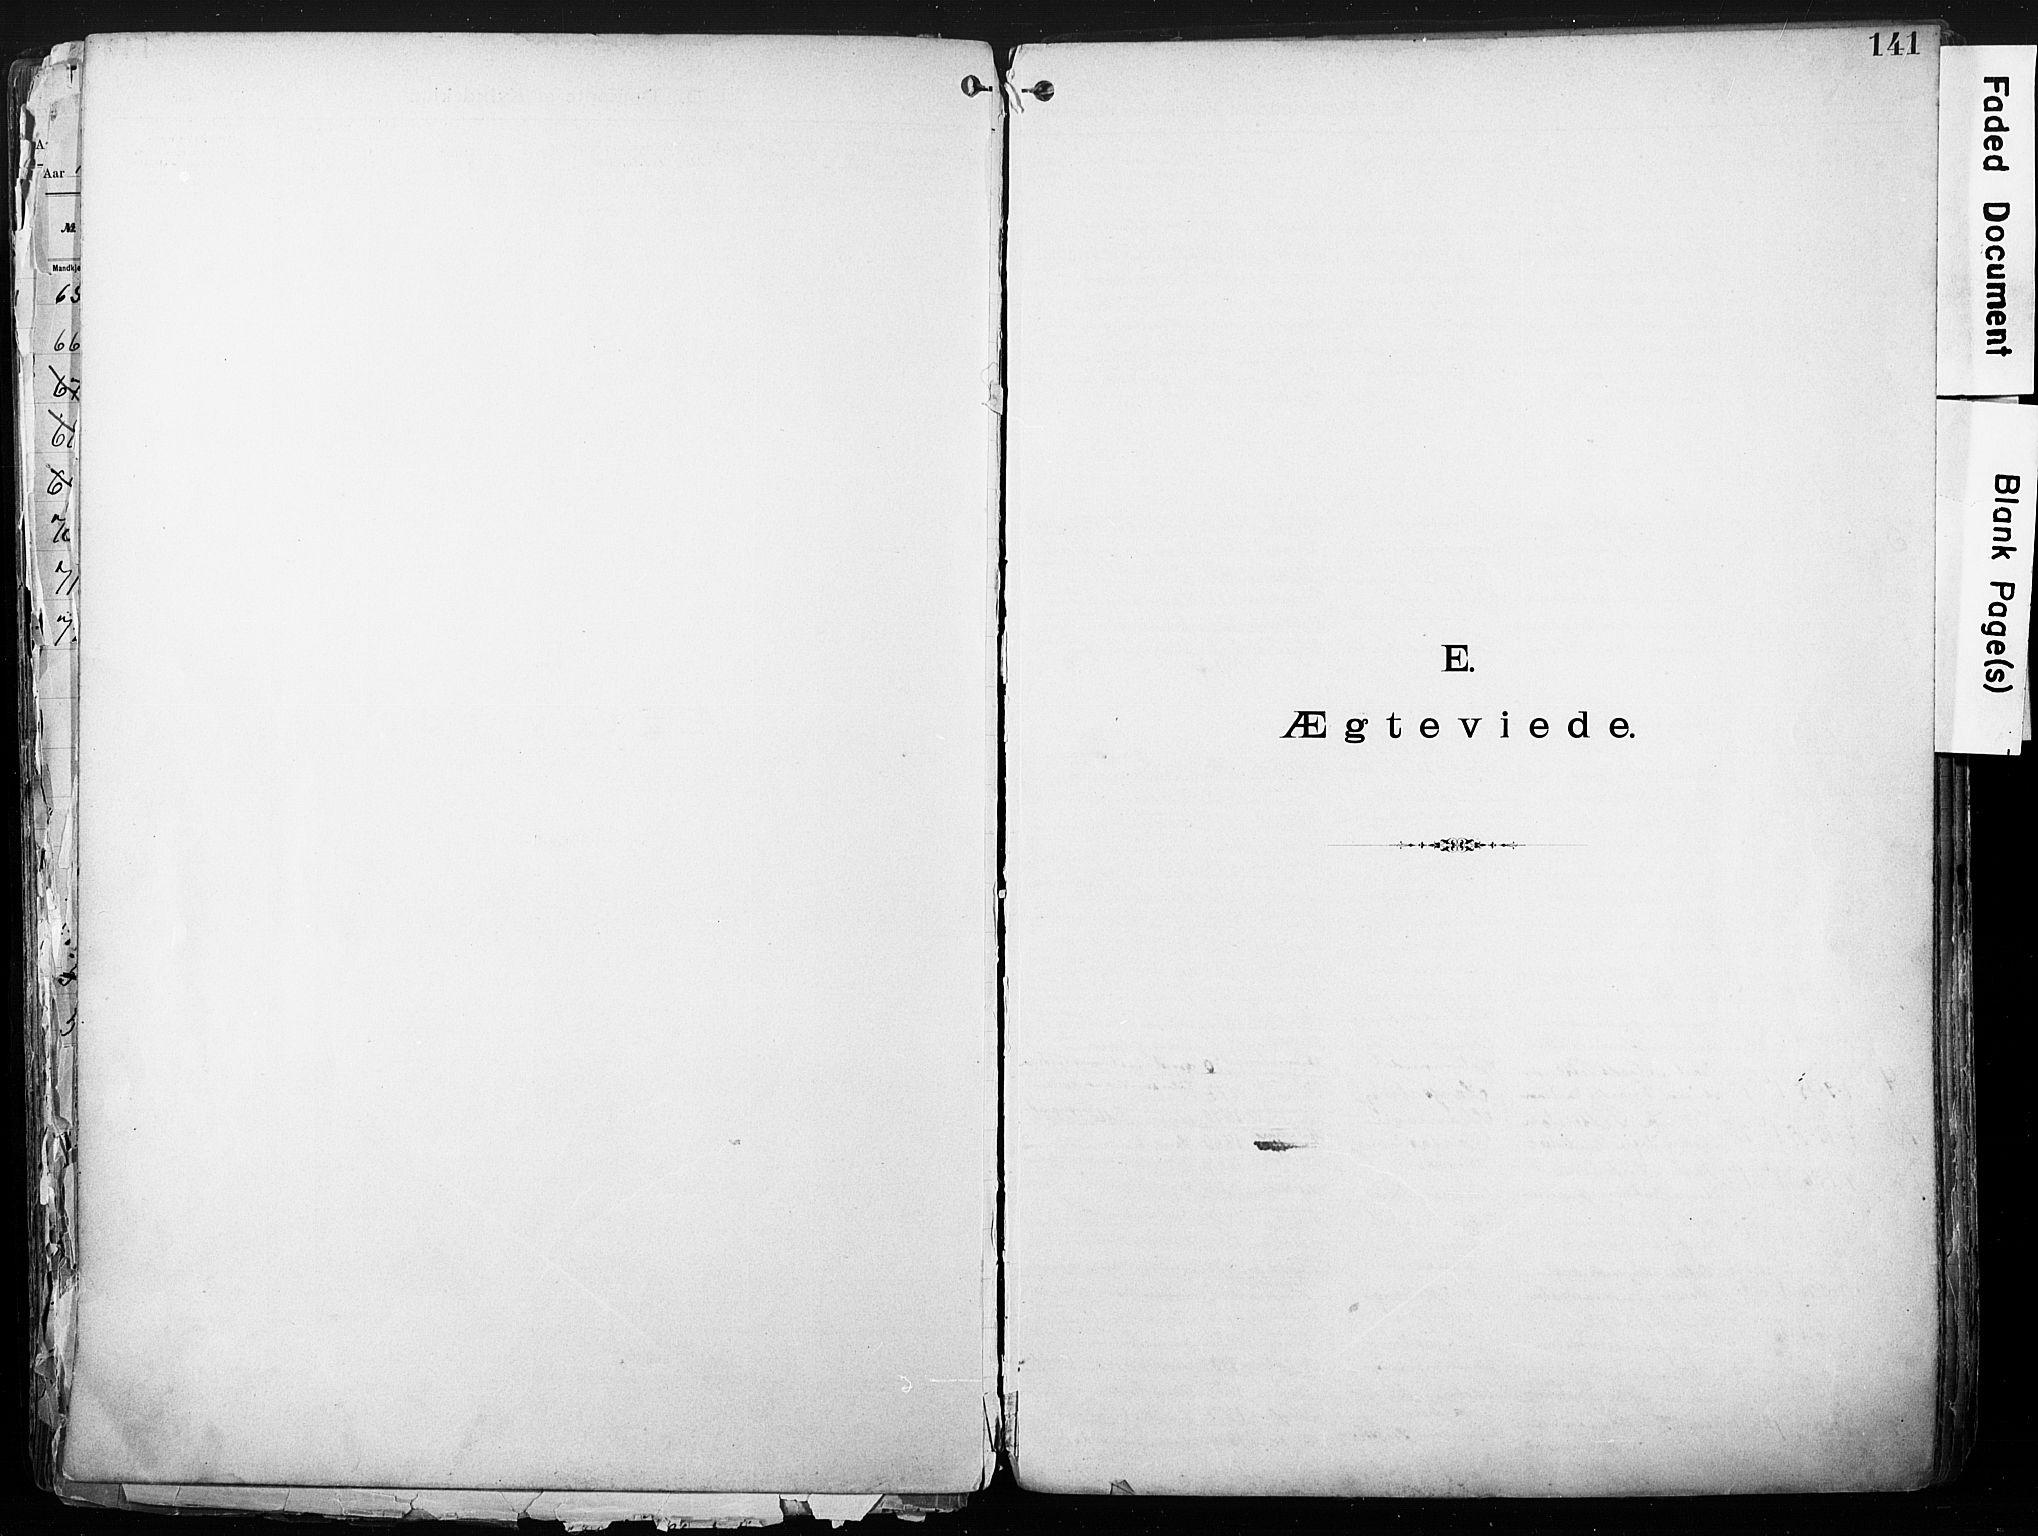 SAO, Sarpsborg metodistkirke, A/L0004: Dissenterprotokoll nr. 4, 1892-1923, s. 141